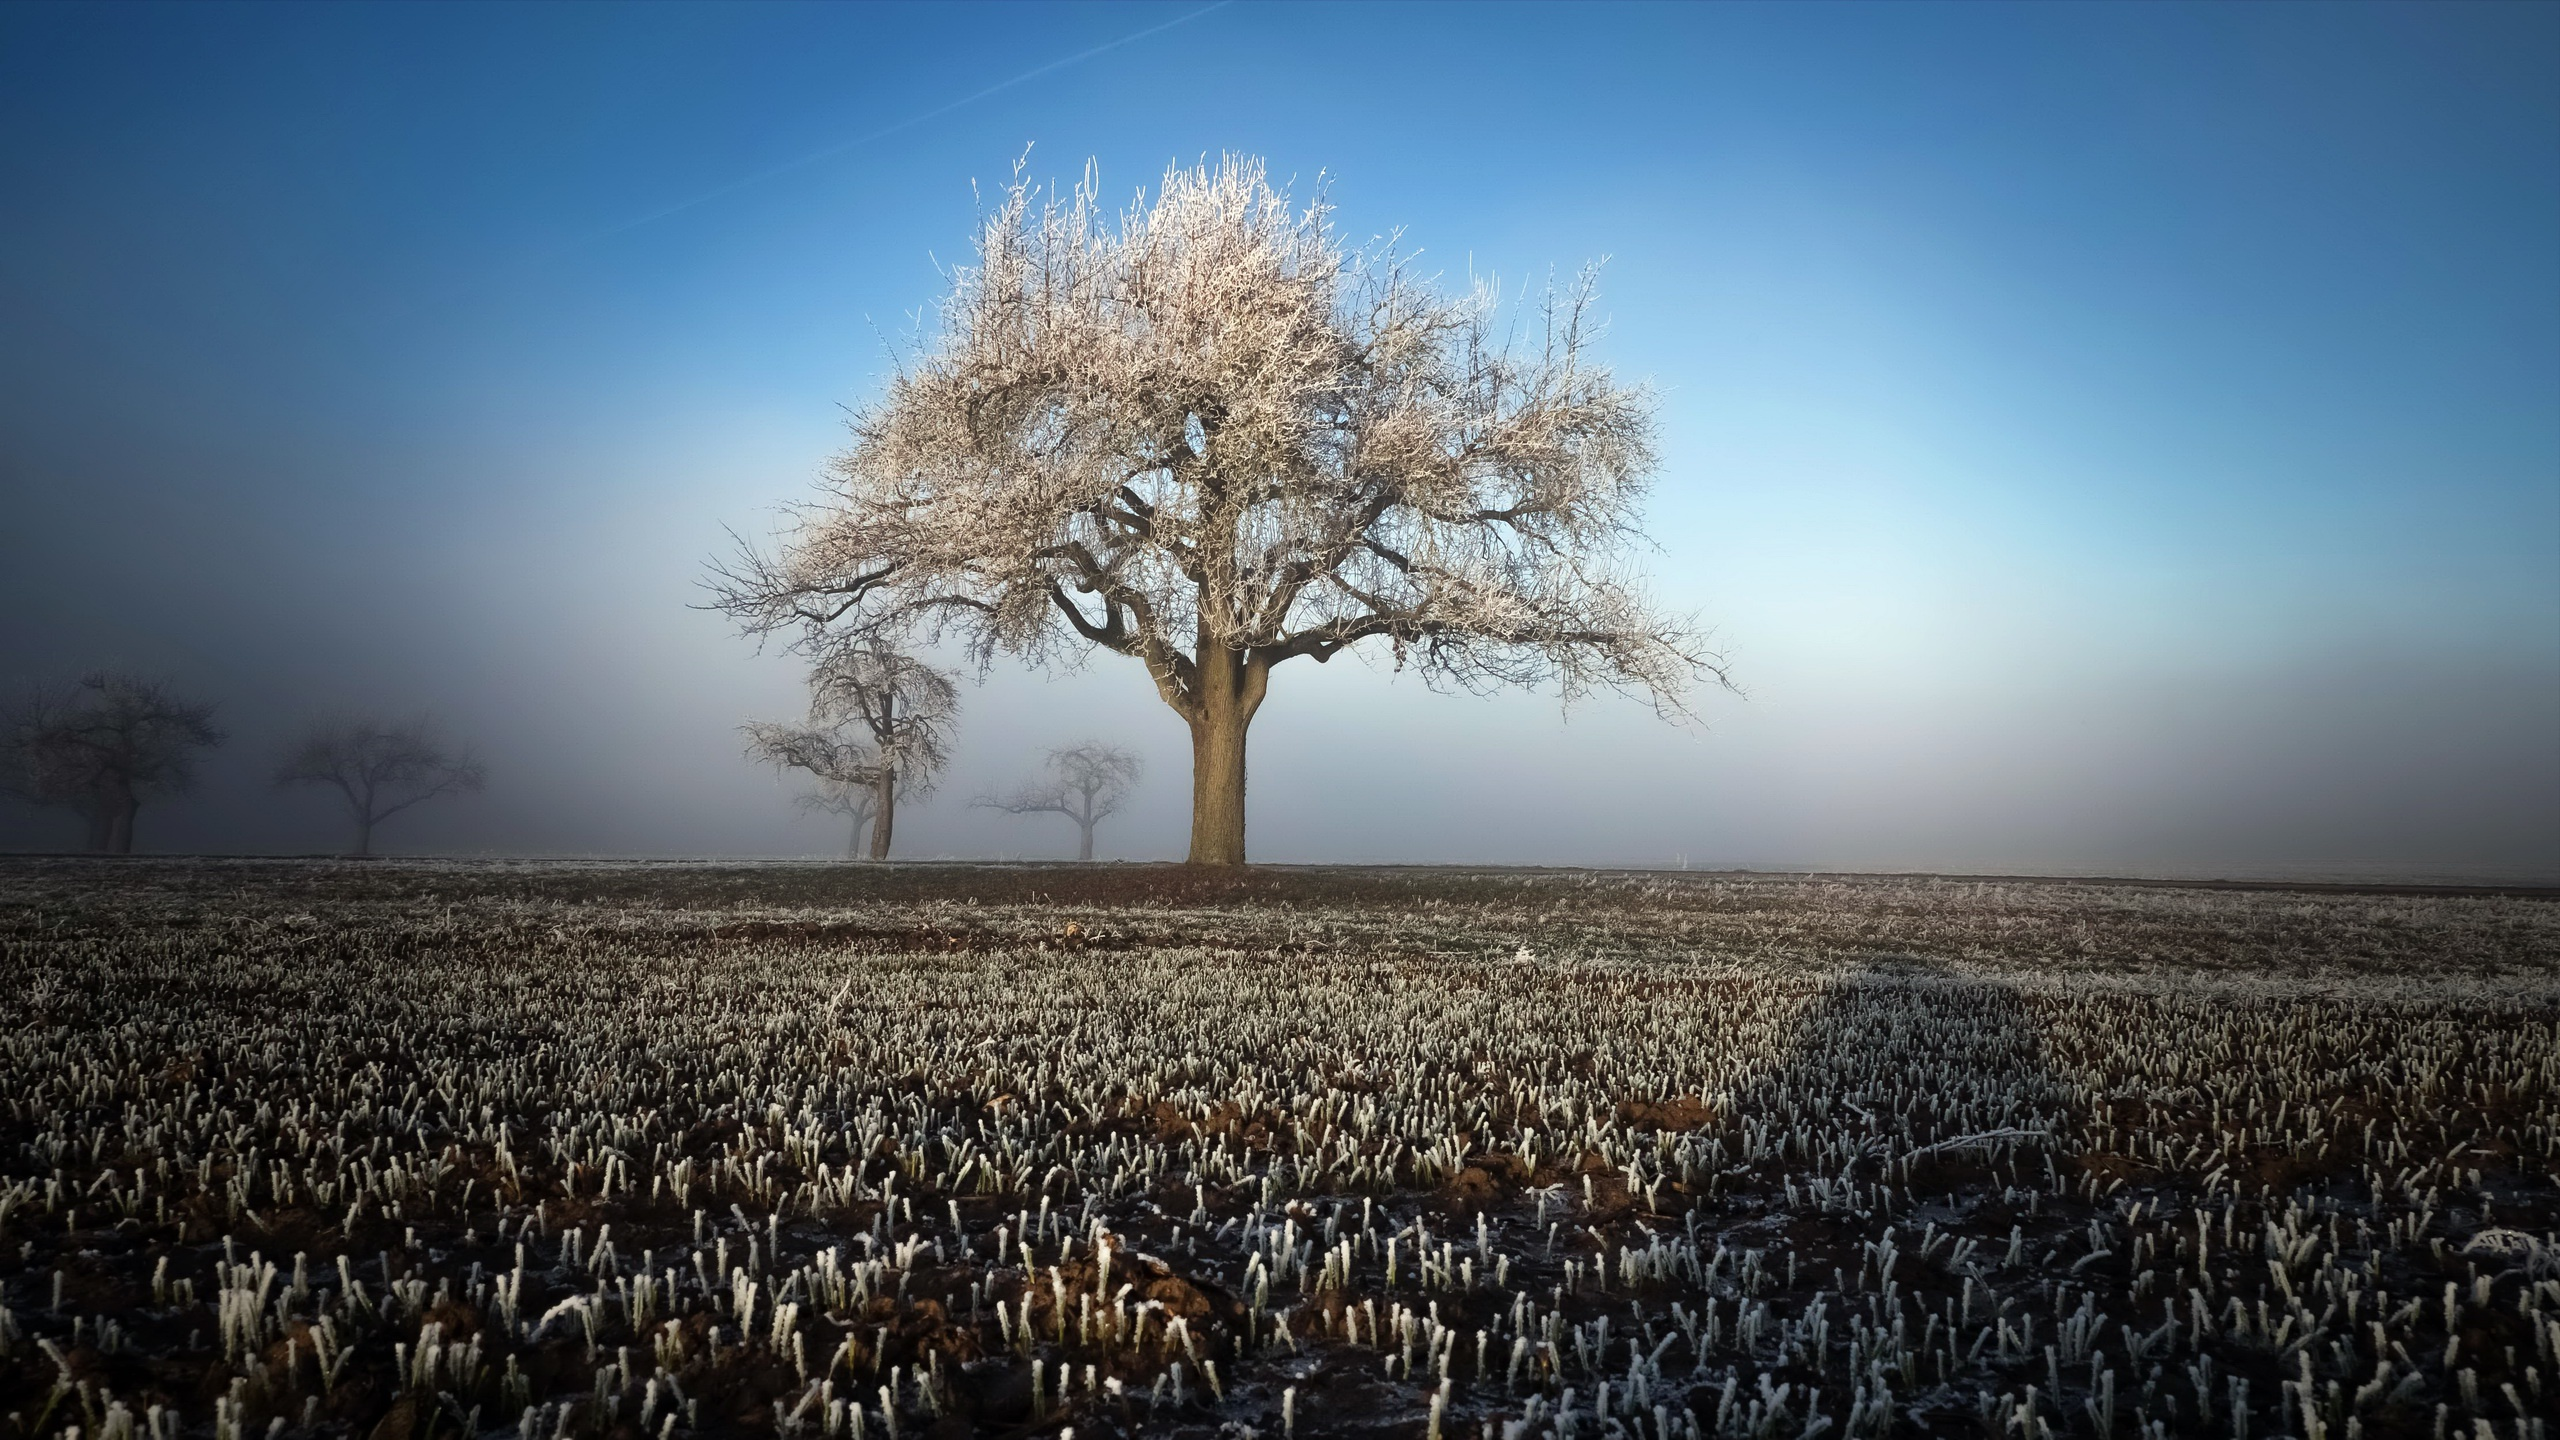 800x1280 Winter Field Landscape Trees Nexus 7 Samsung Galaxy